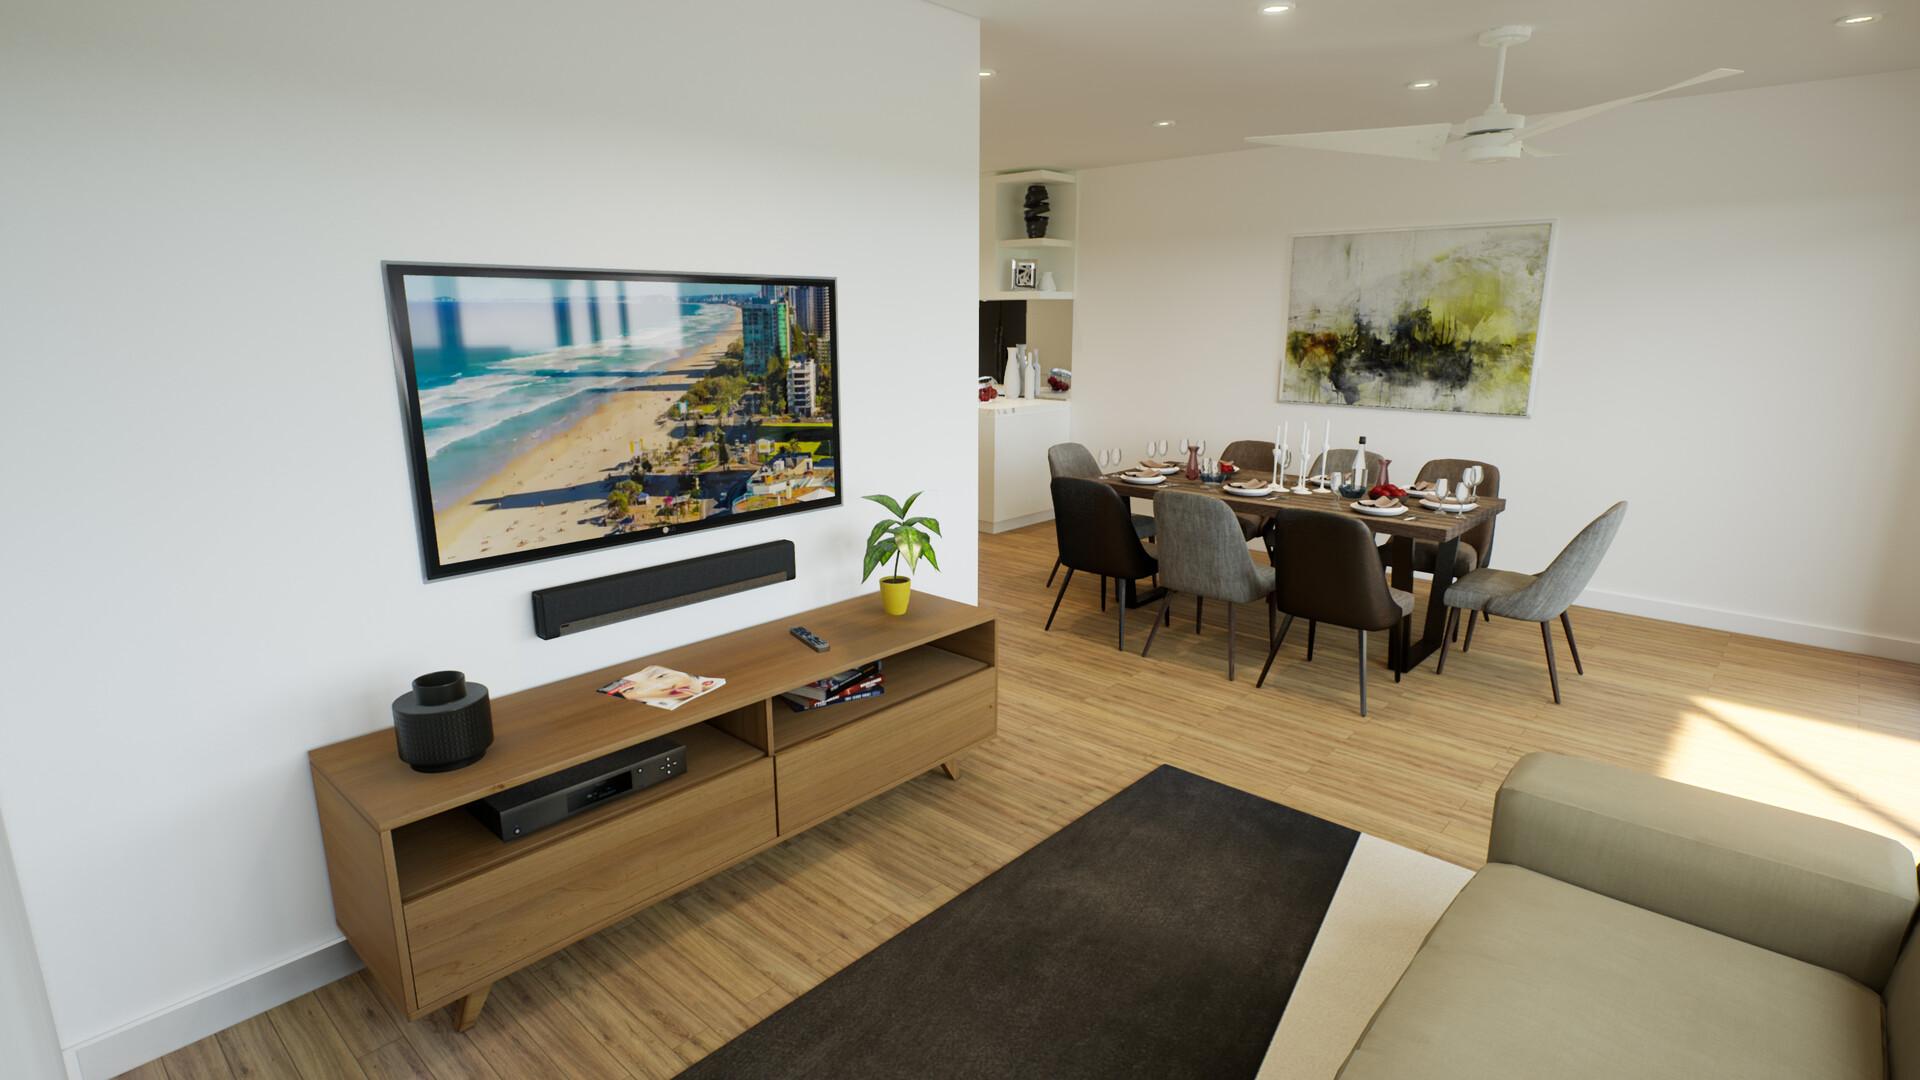 Jordan younie loungeroom